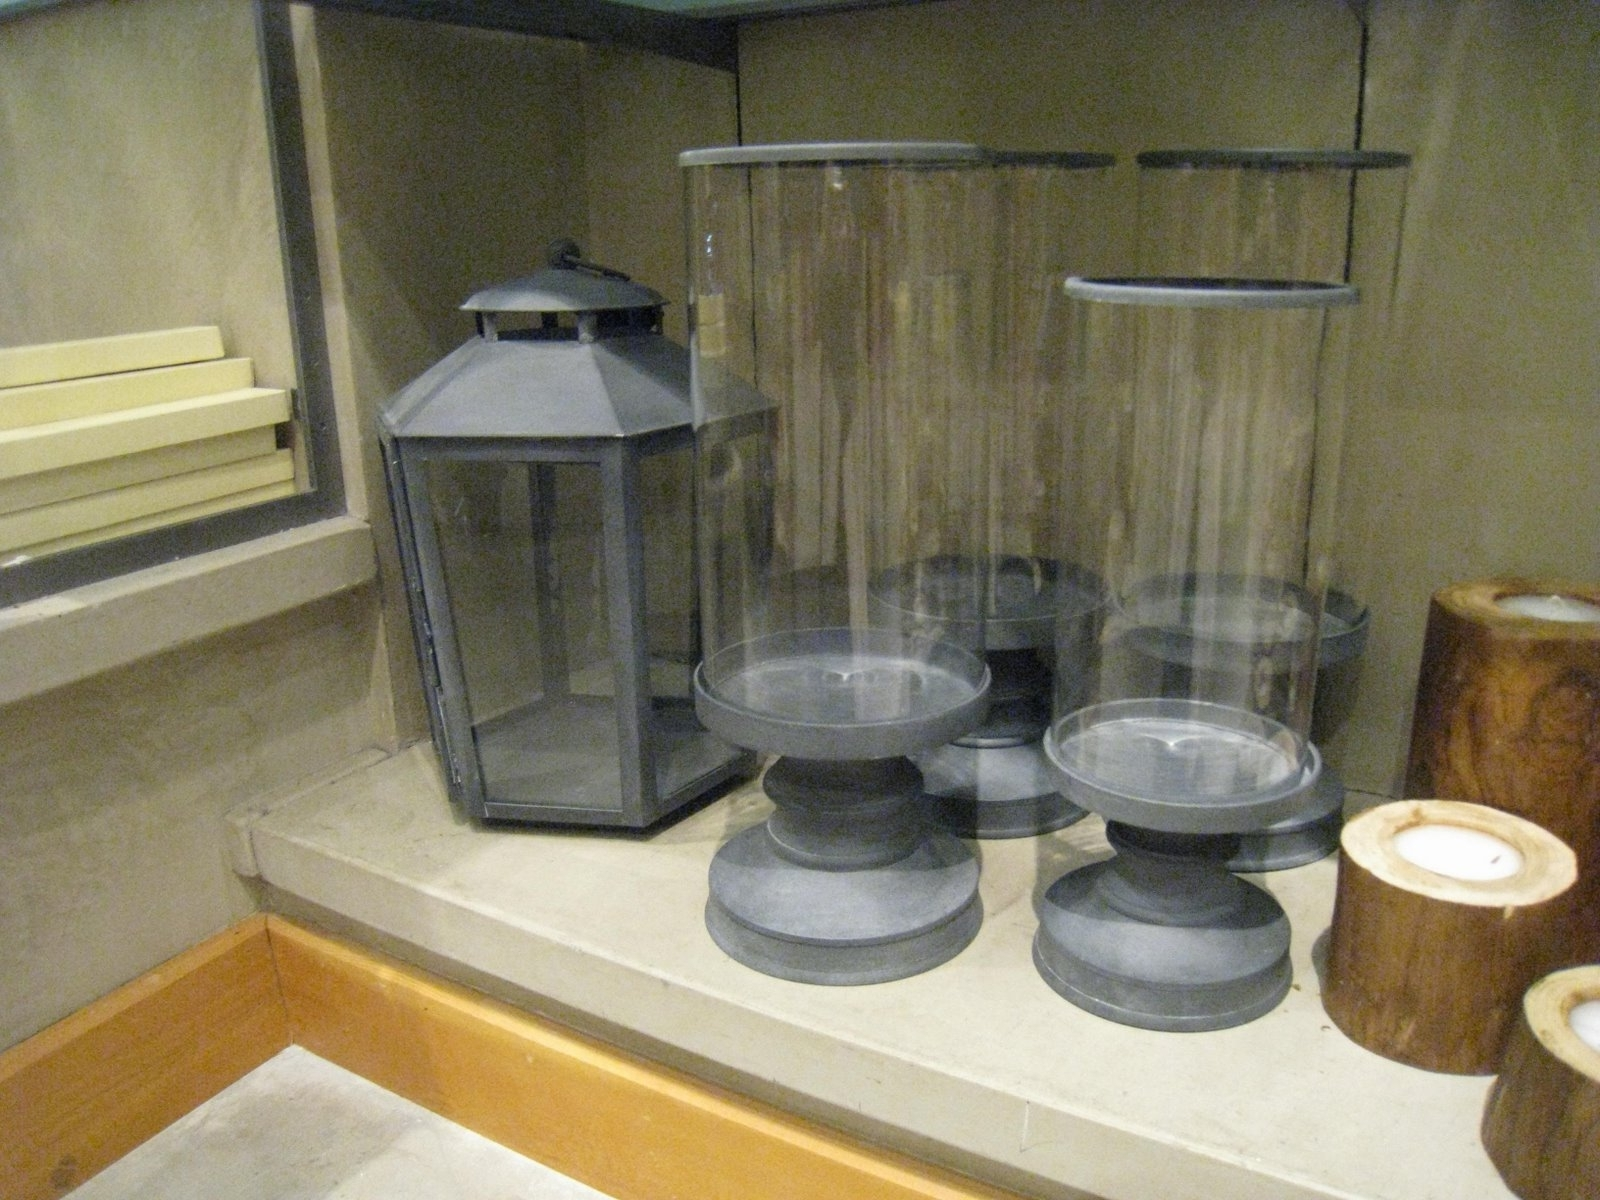 Well Liked Zinc Outdoor Lanterns With Regard To Weathered Zinc Garden Lanterns : Katy Elliott (View 12 of 20)